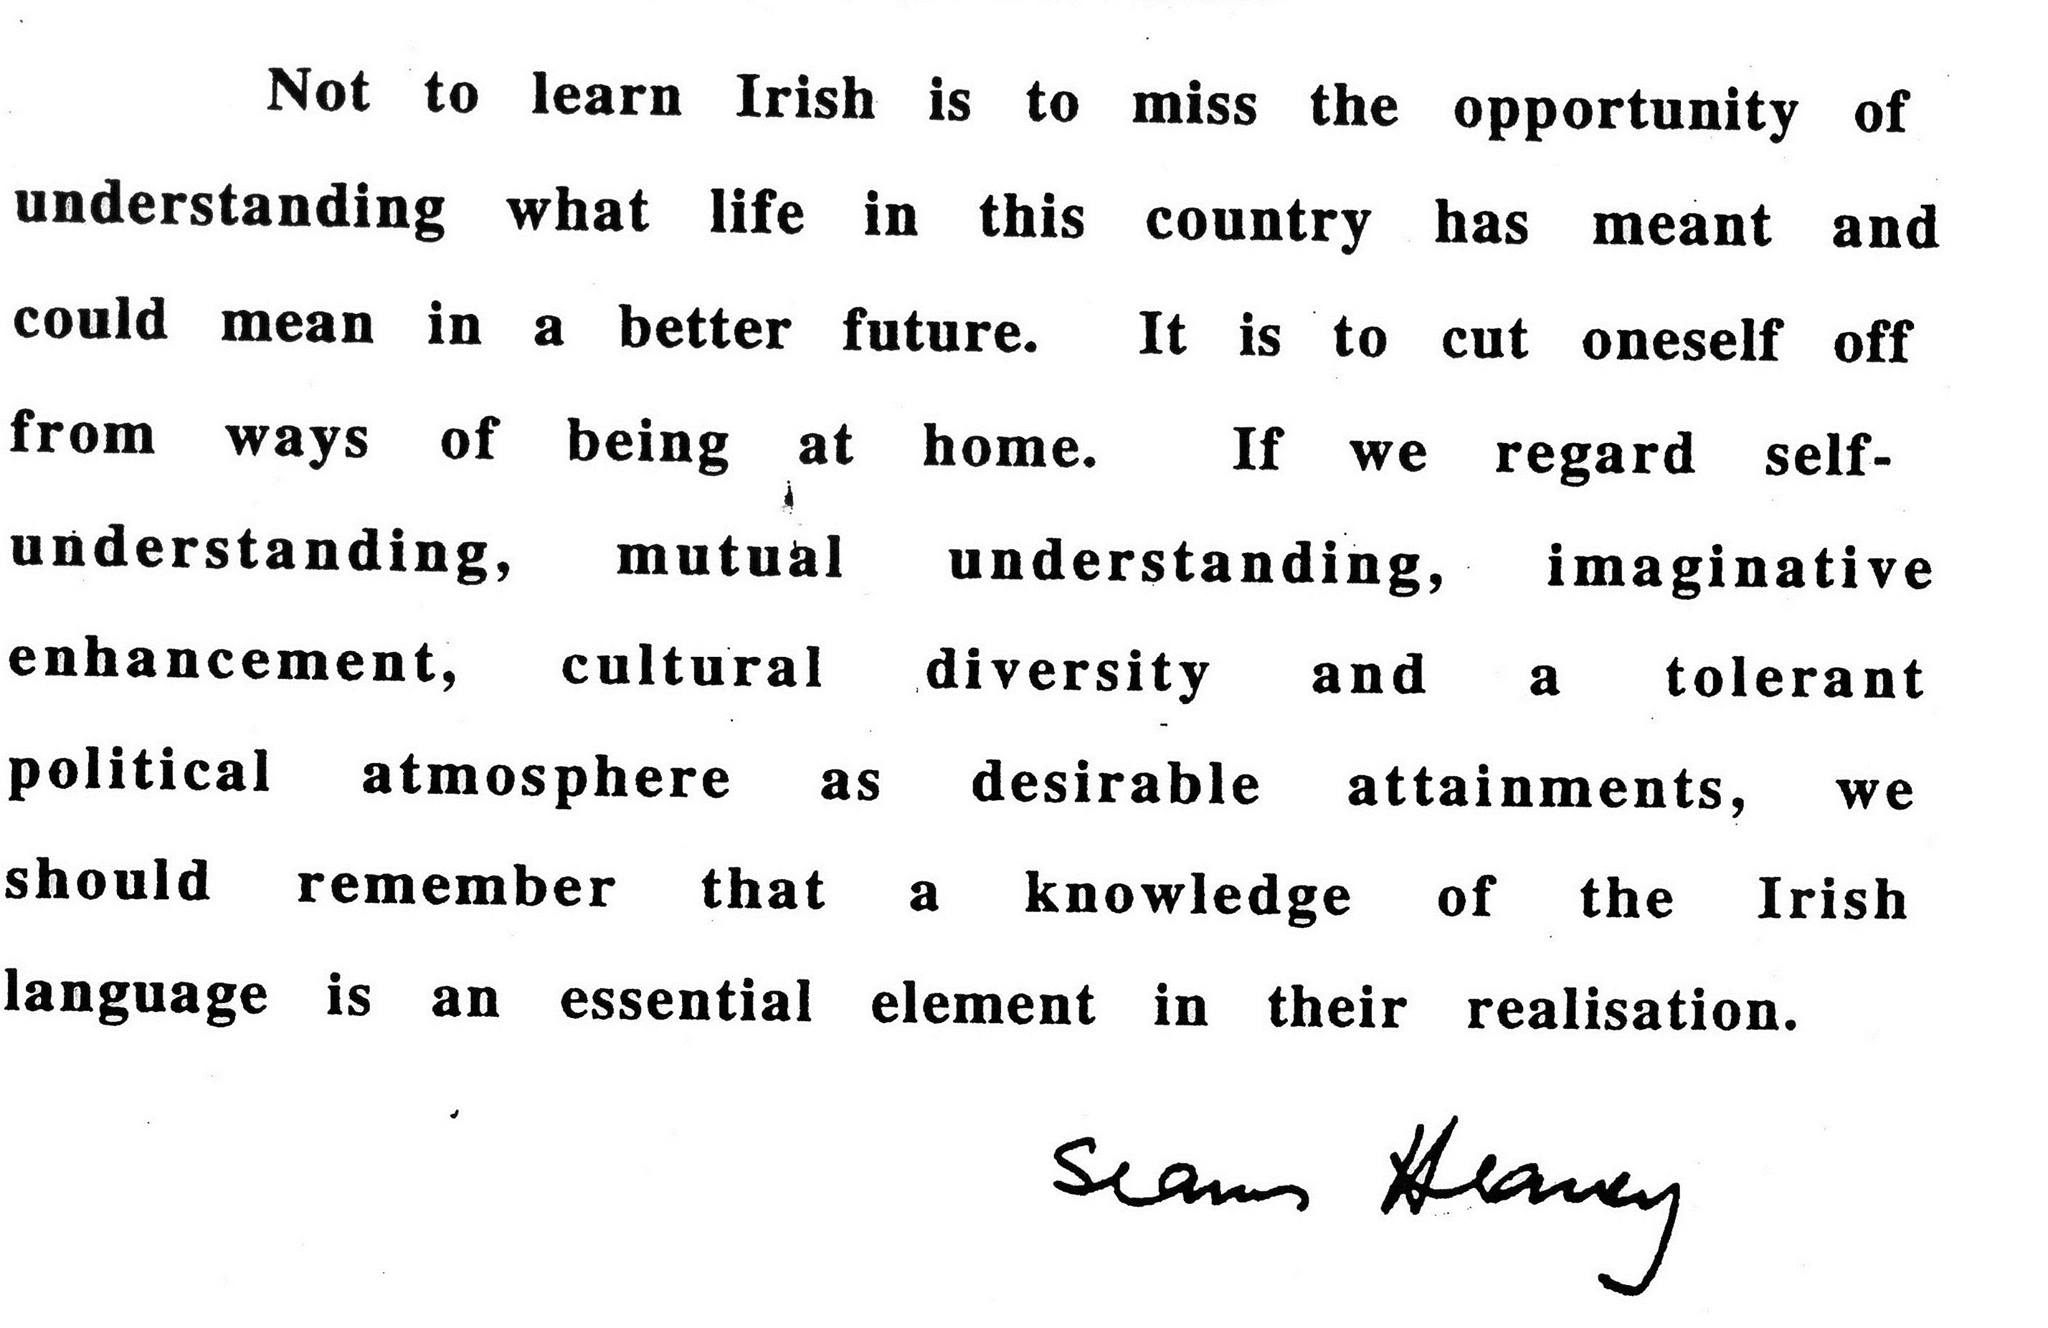 irish language Photo: the president of the irish language school sydney, aoife ní éalaí and  his excellency breandán ó caollaí at the opening of the scoil gheimhridh.